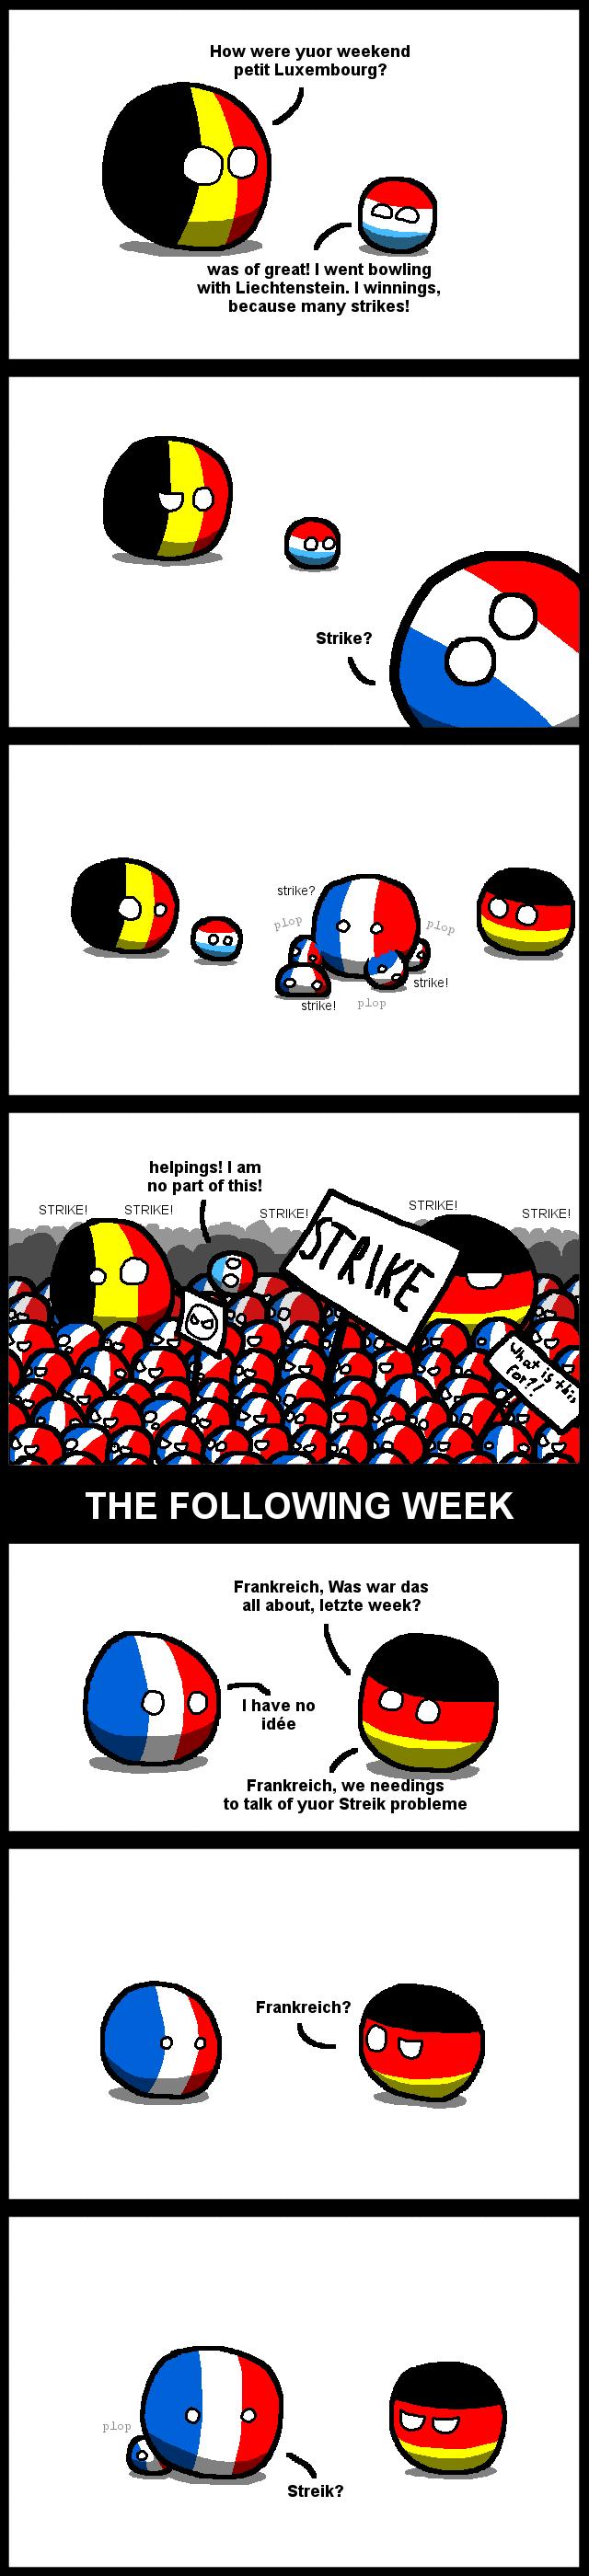 France's Problem